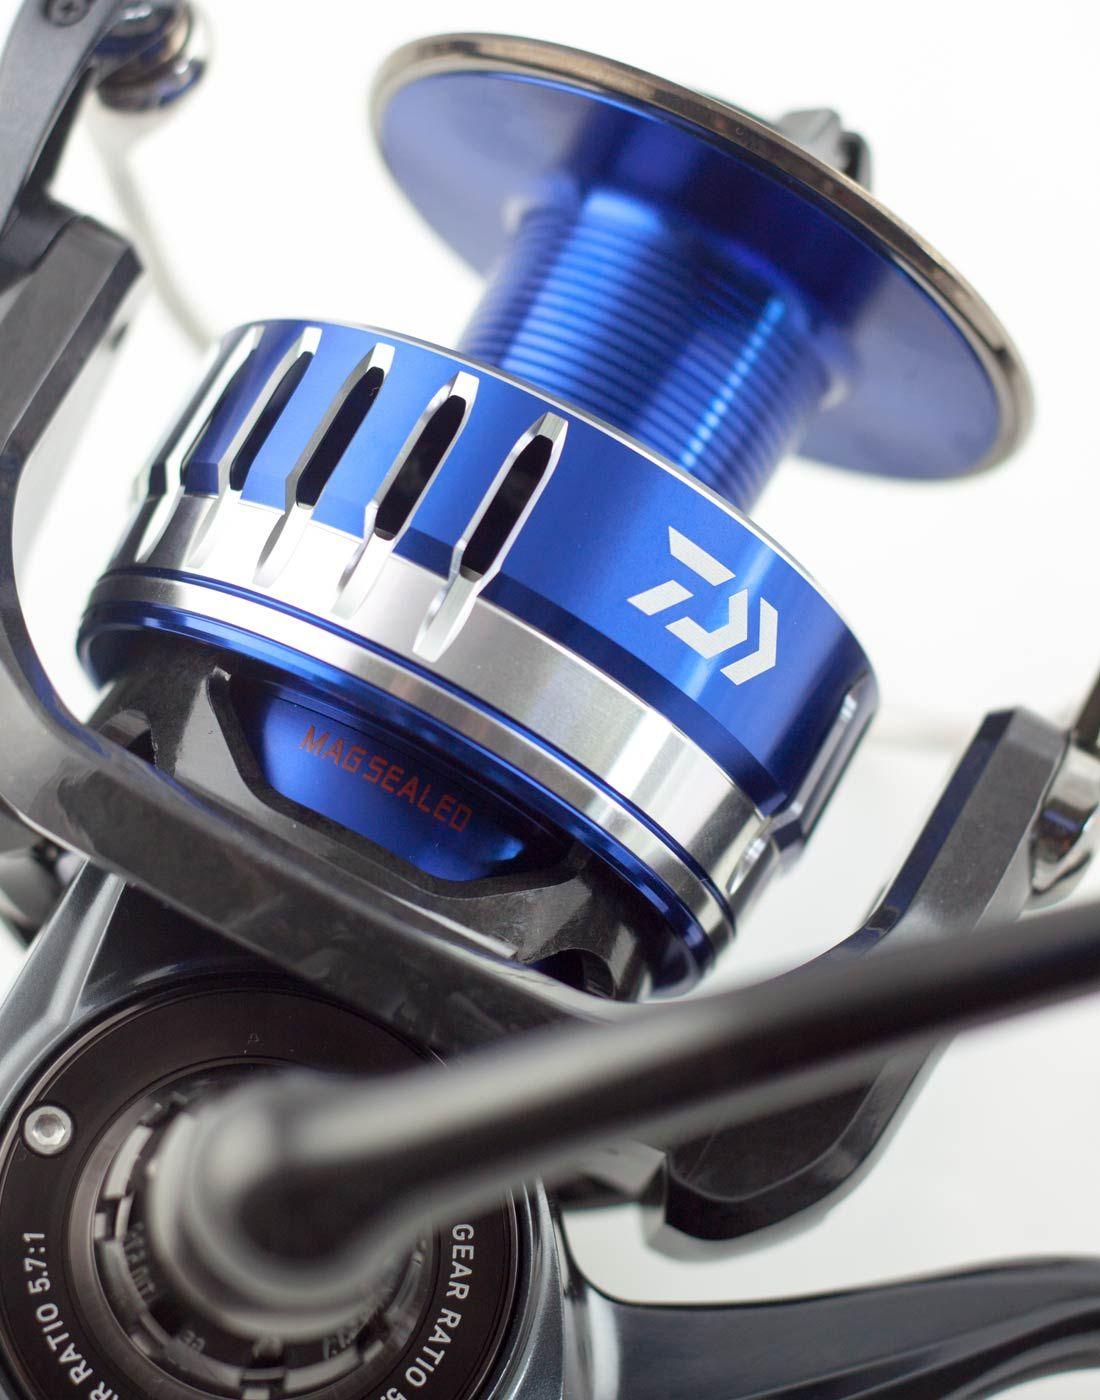 b6d9741a612 Daiwa Saltiga 6500 H | Angelrollen mit Frontbremse | Fishing reels ...